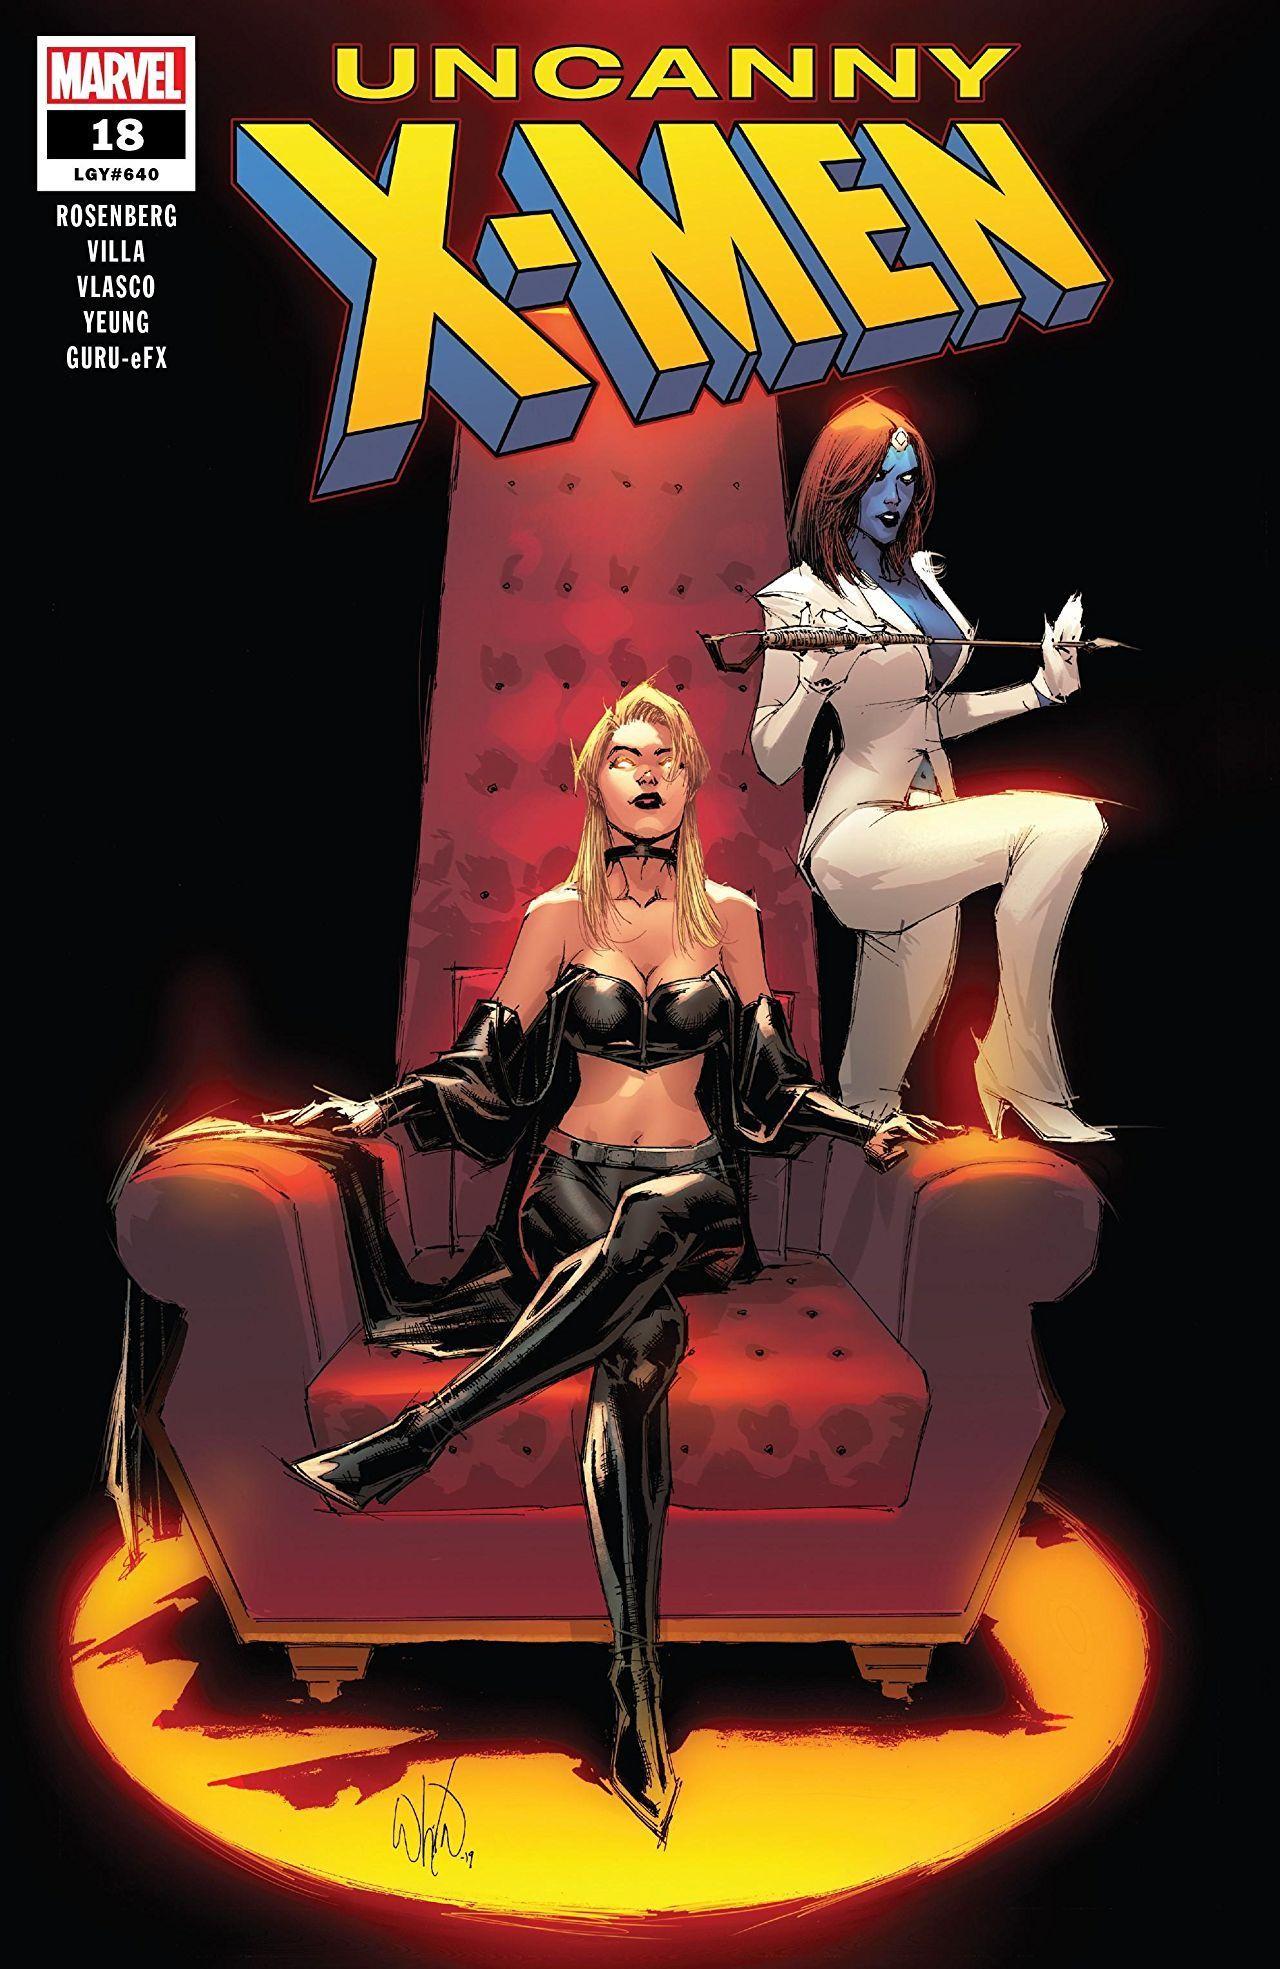 Tag 1 sur DC Earth - Forum RPG Comics 49032efa895bdb43a36e7c1f58dadf59cce0941c